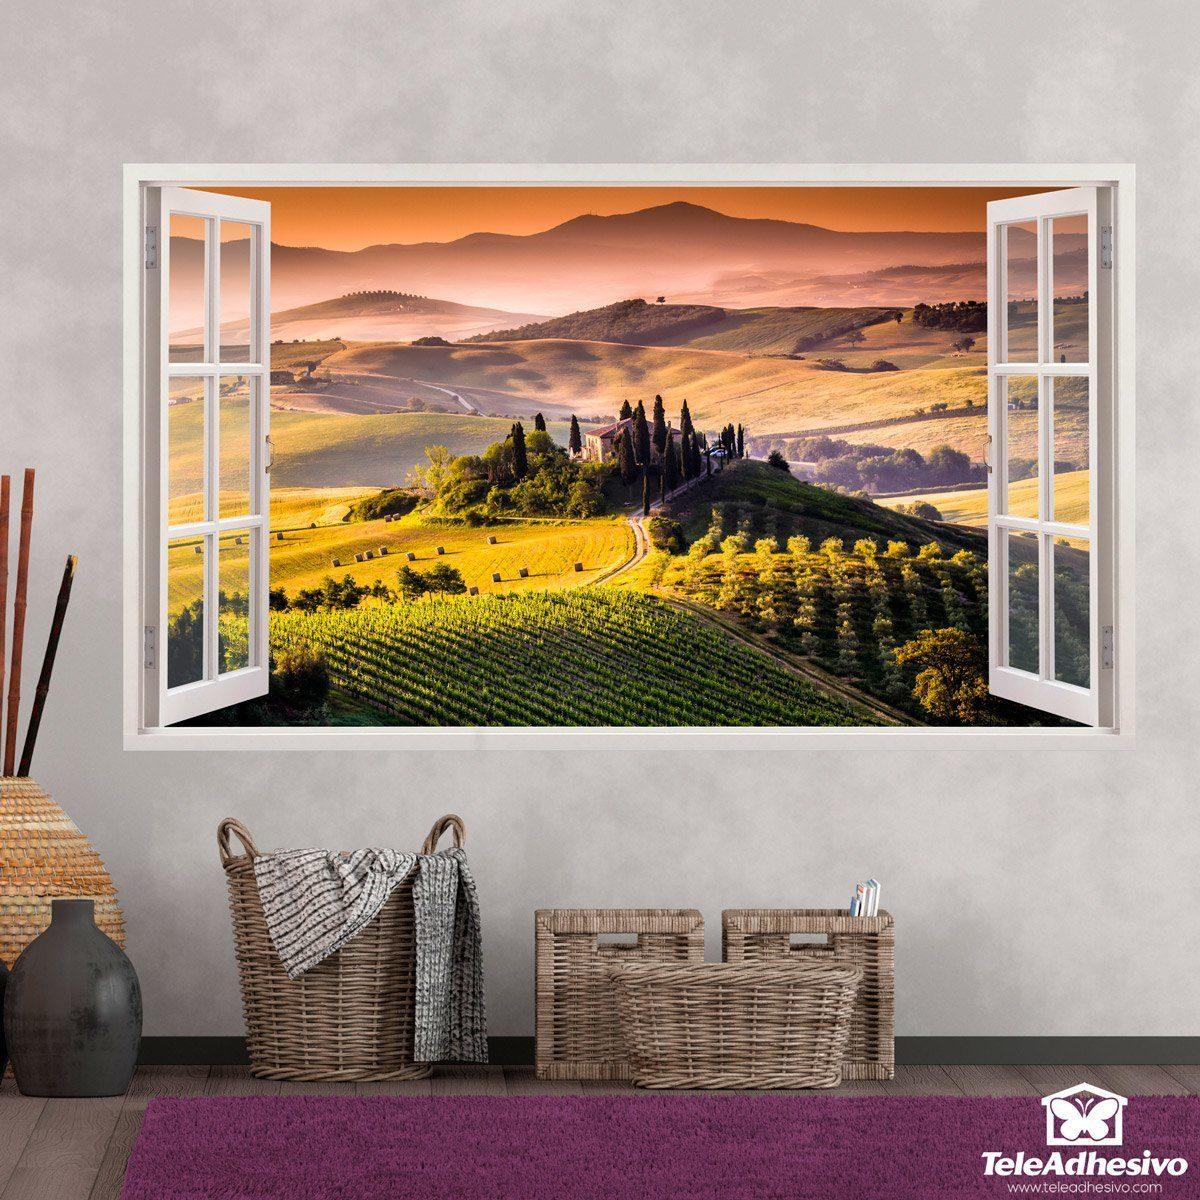 Negozio di sconti online,Adesivi Murali 3d Paesaggi